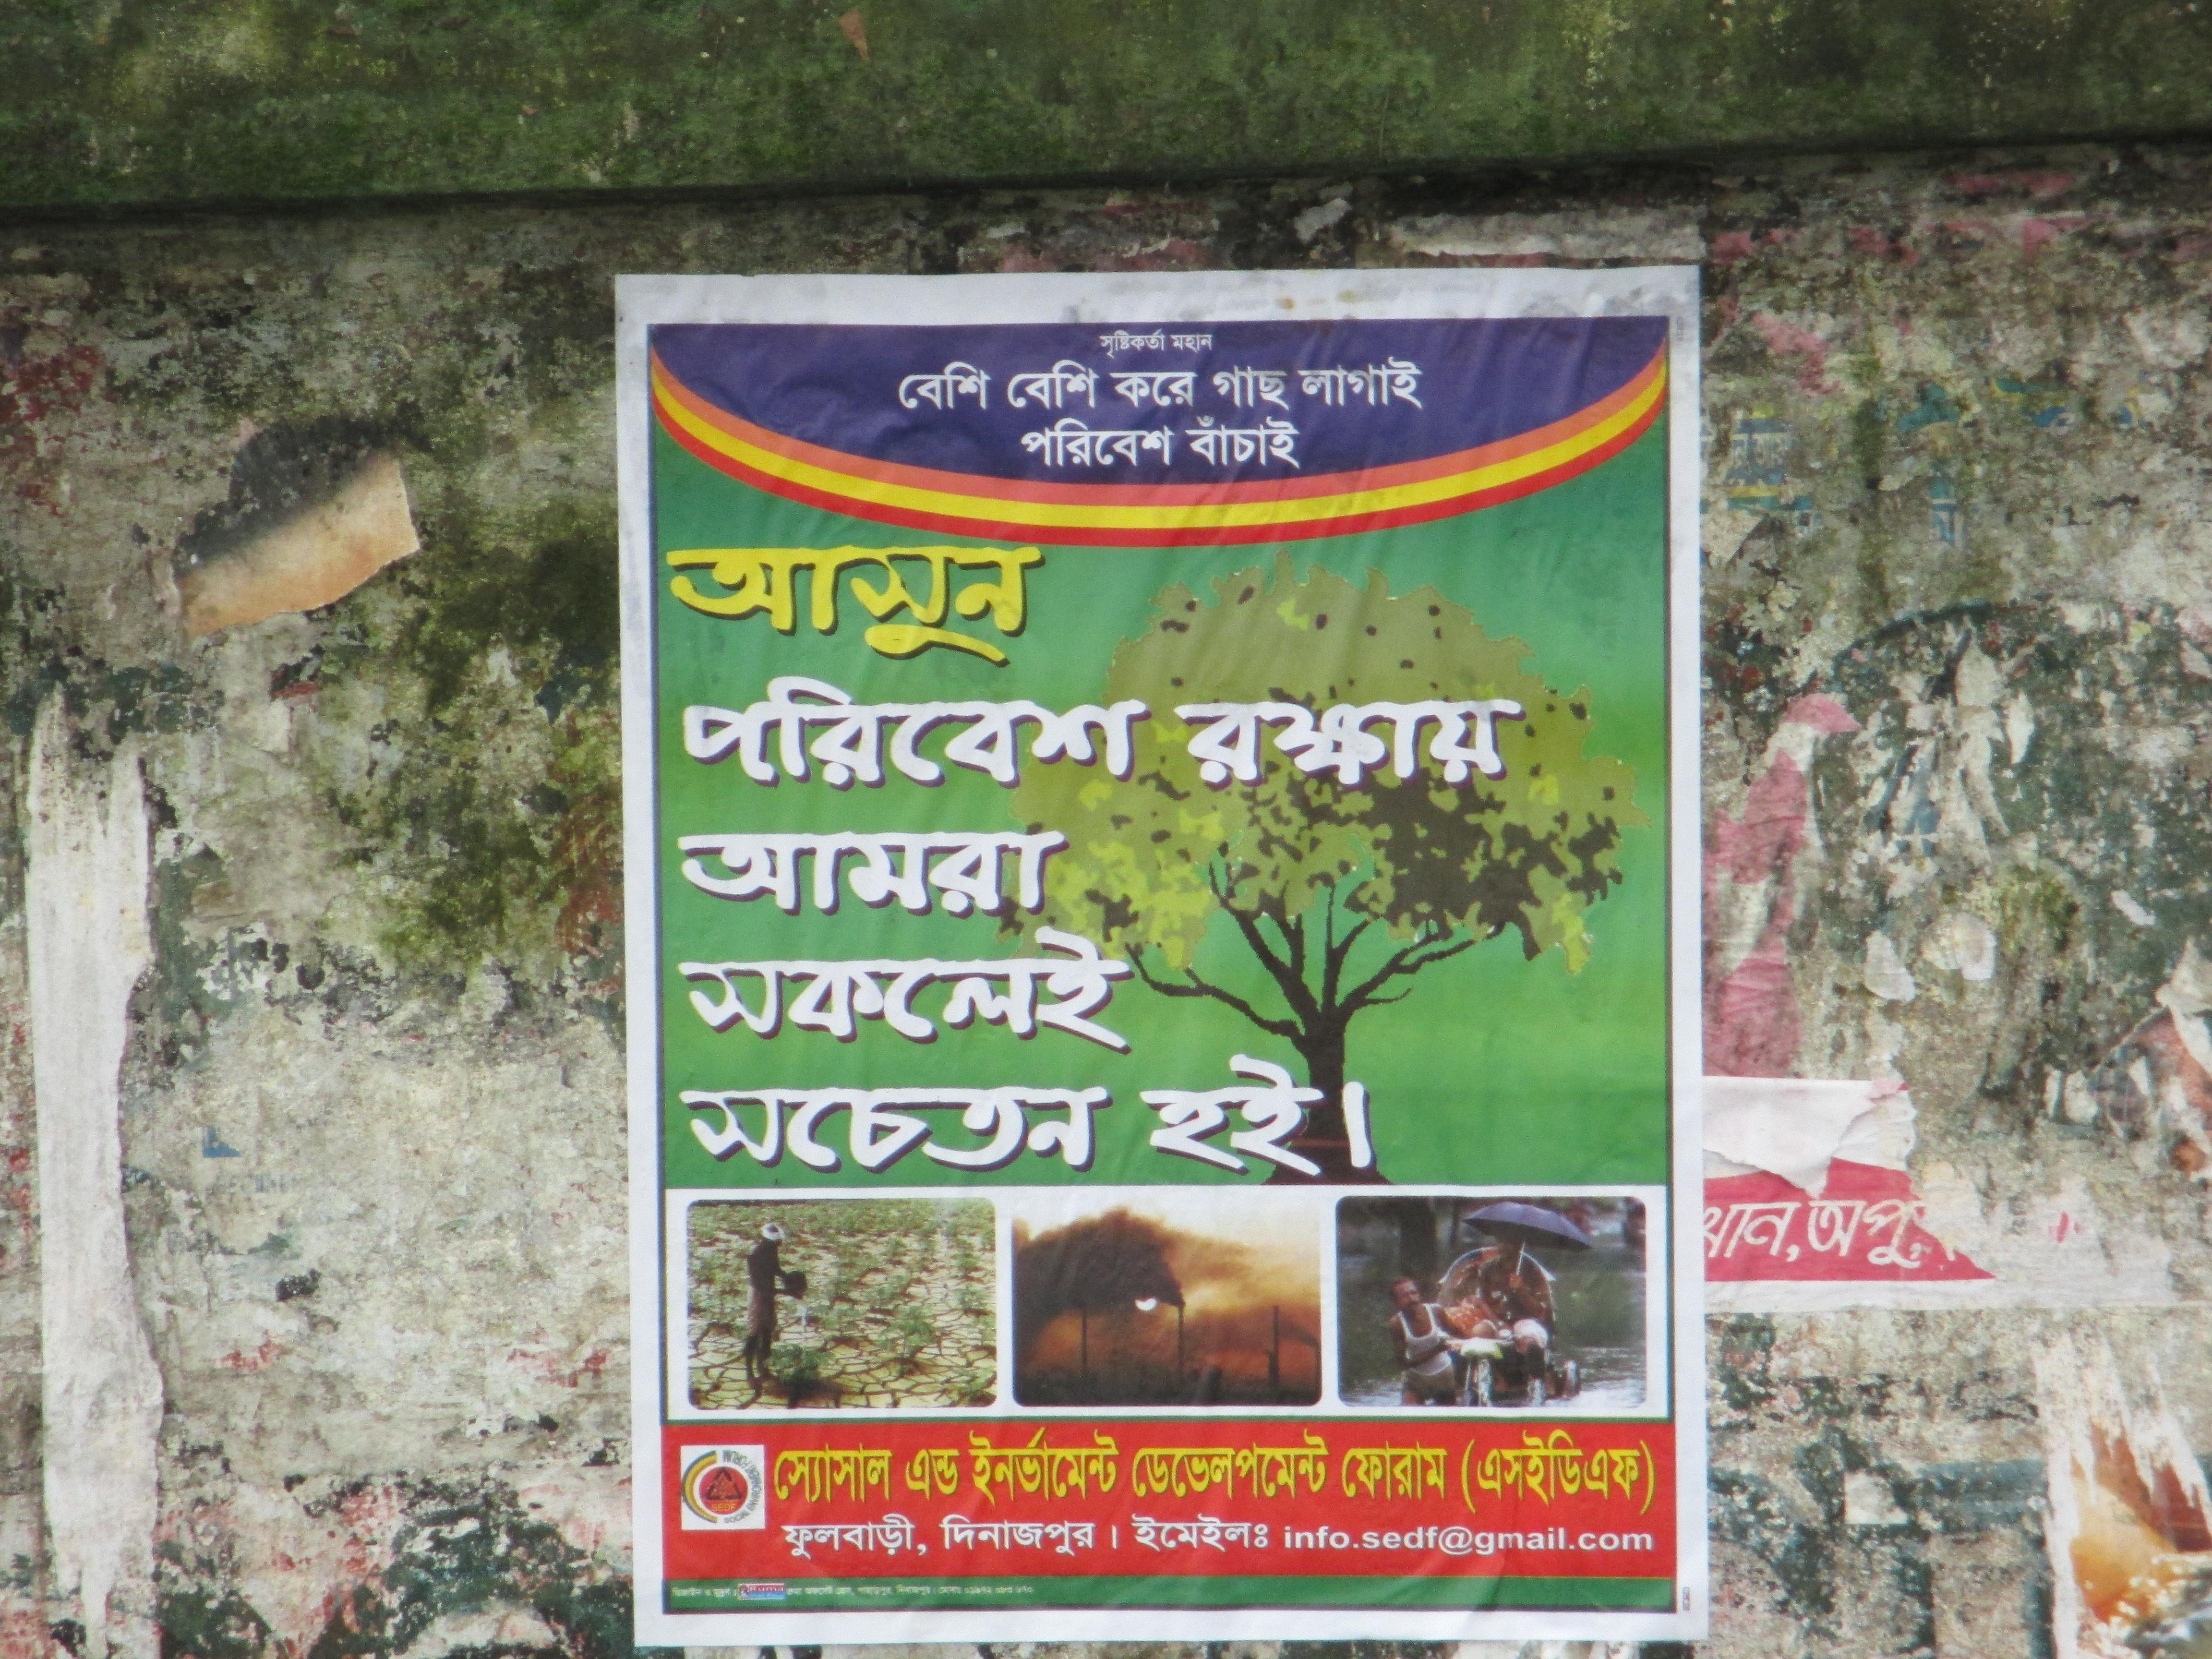 Photos: Remembering the Phulbari Uprising in 2014